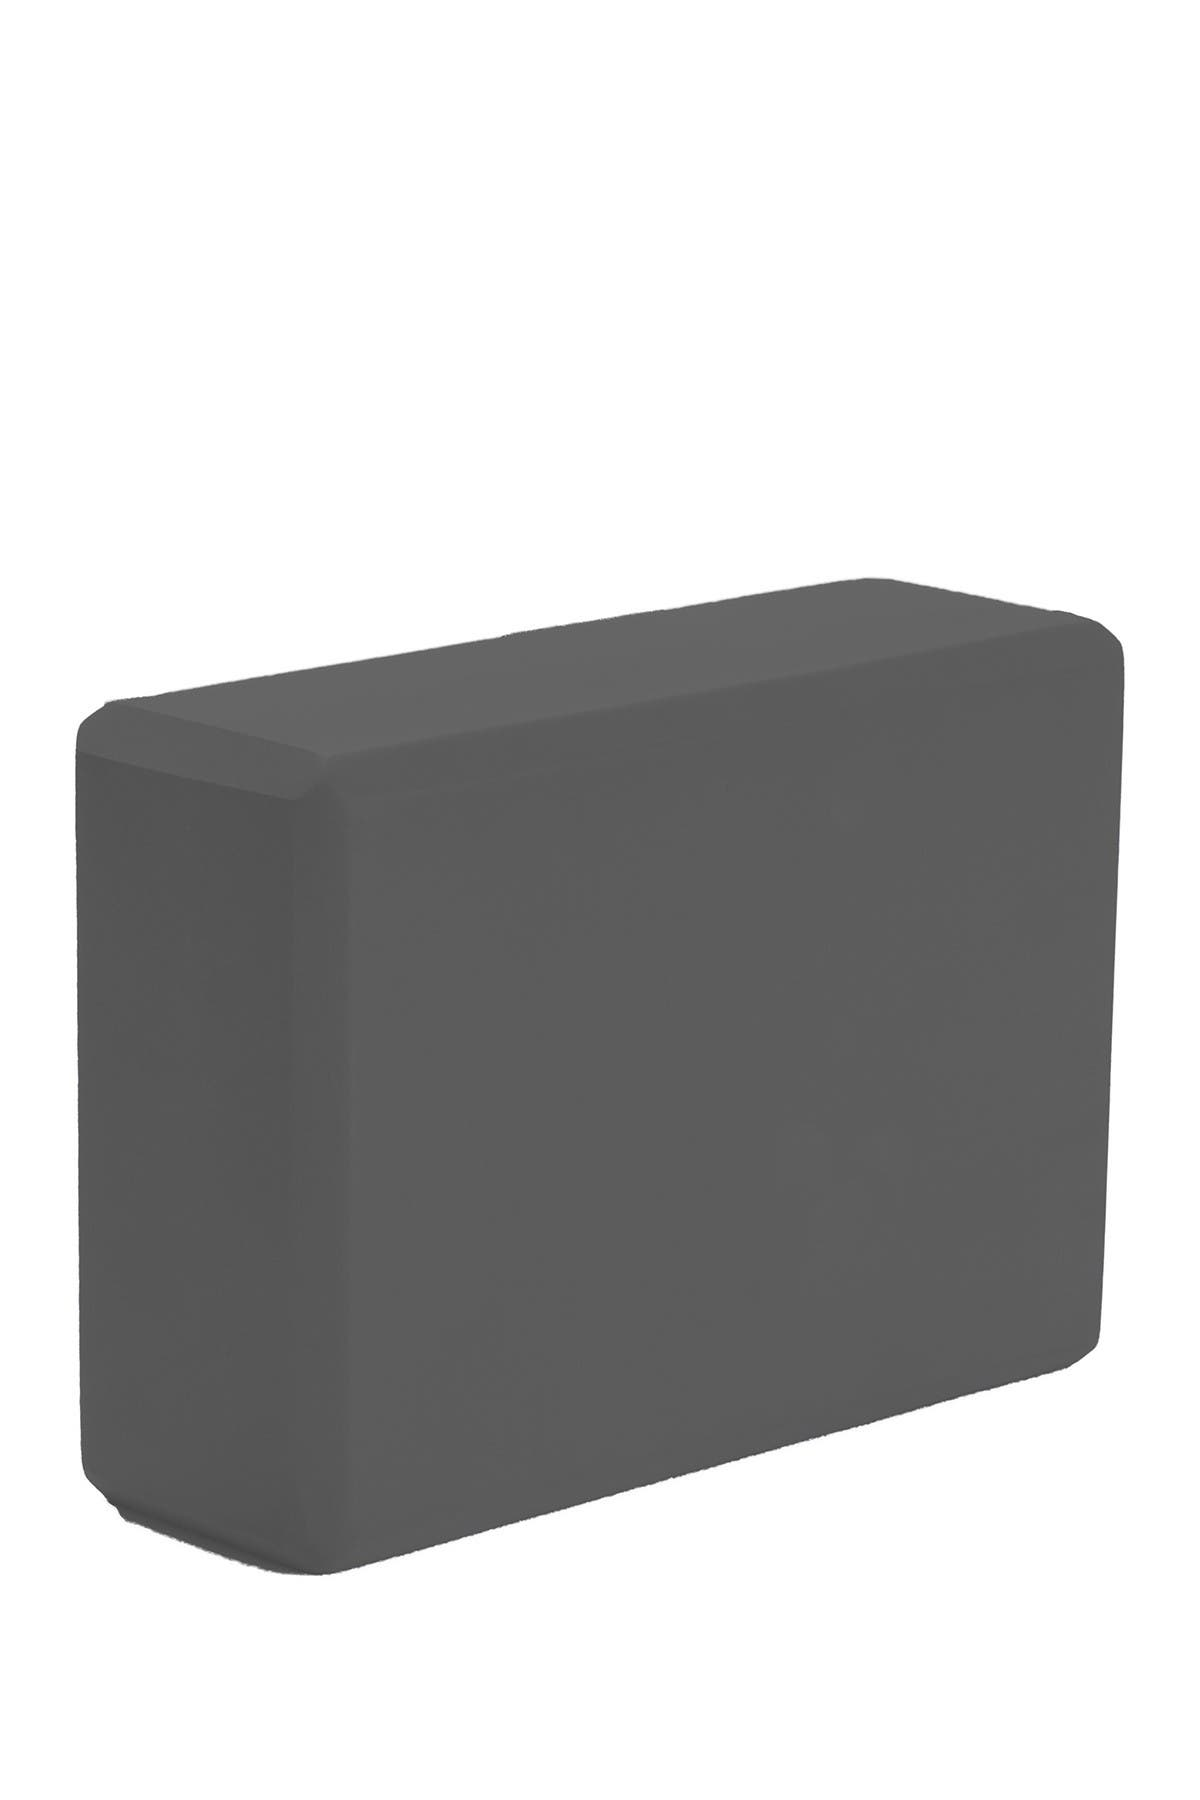 Image of MIND READER Yoga High Density EVA Foam Blocks